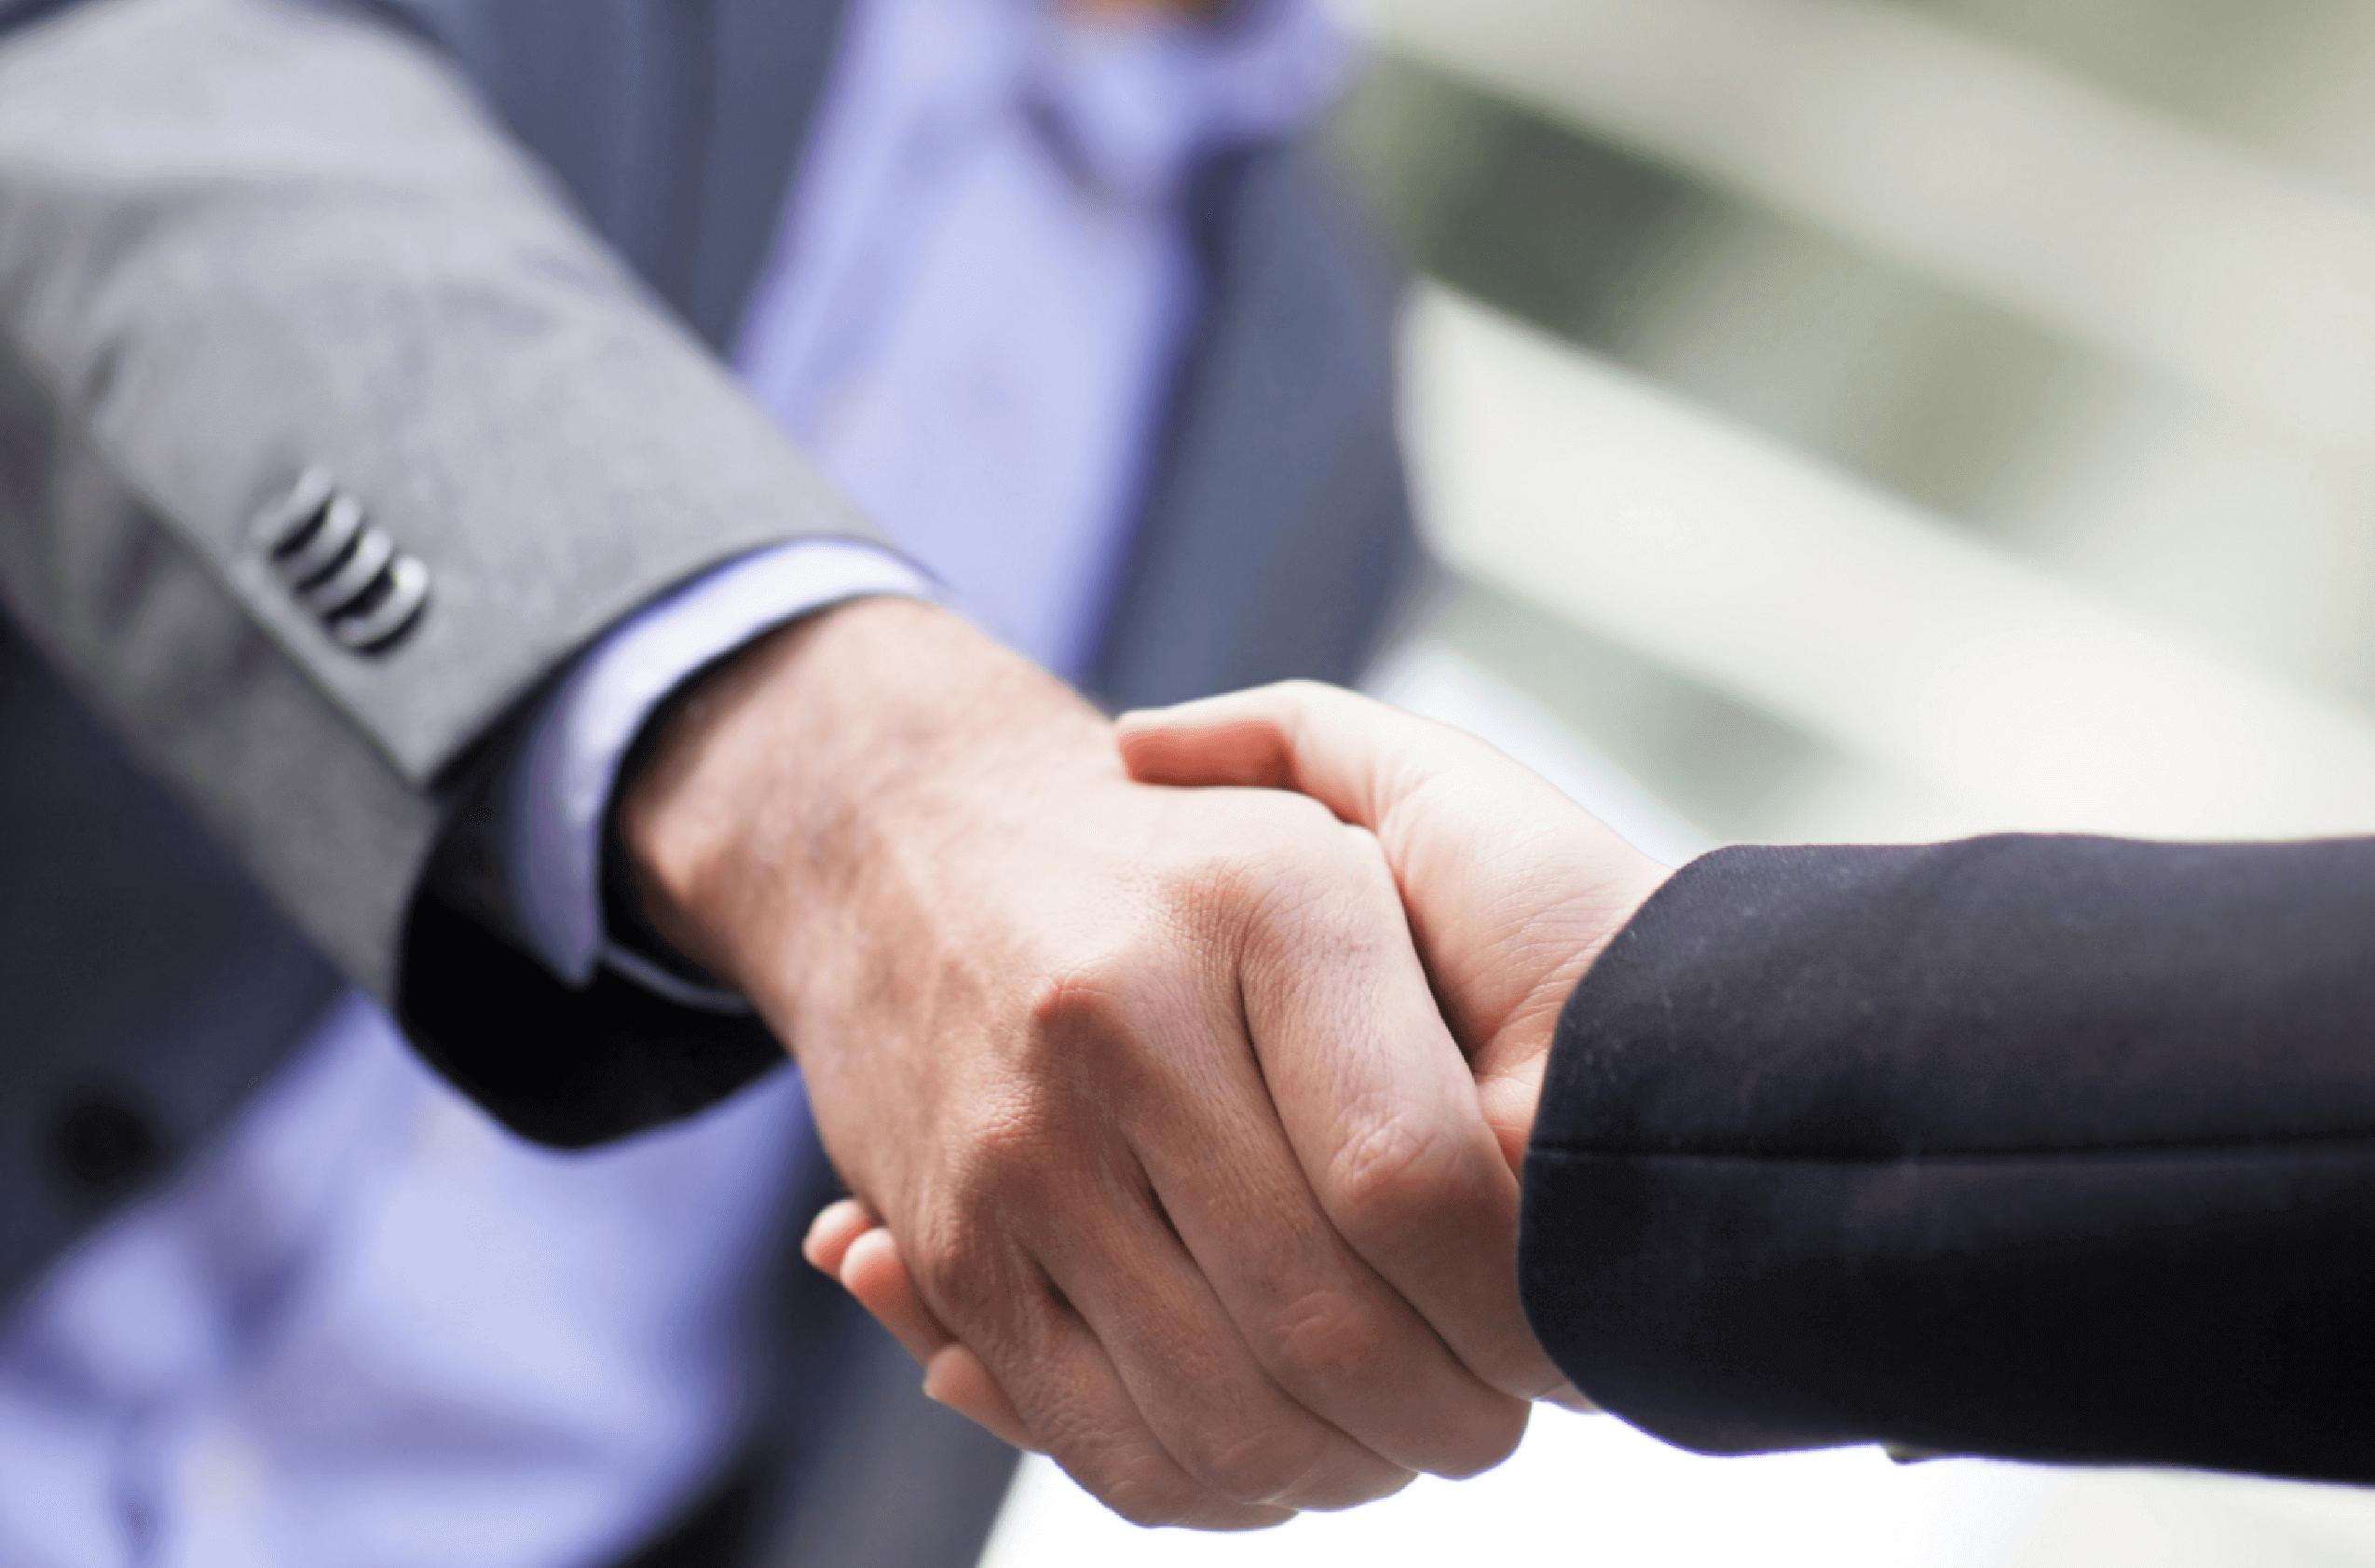 Two business men handshake